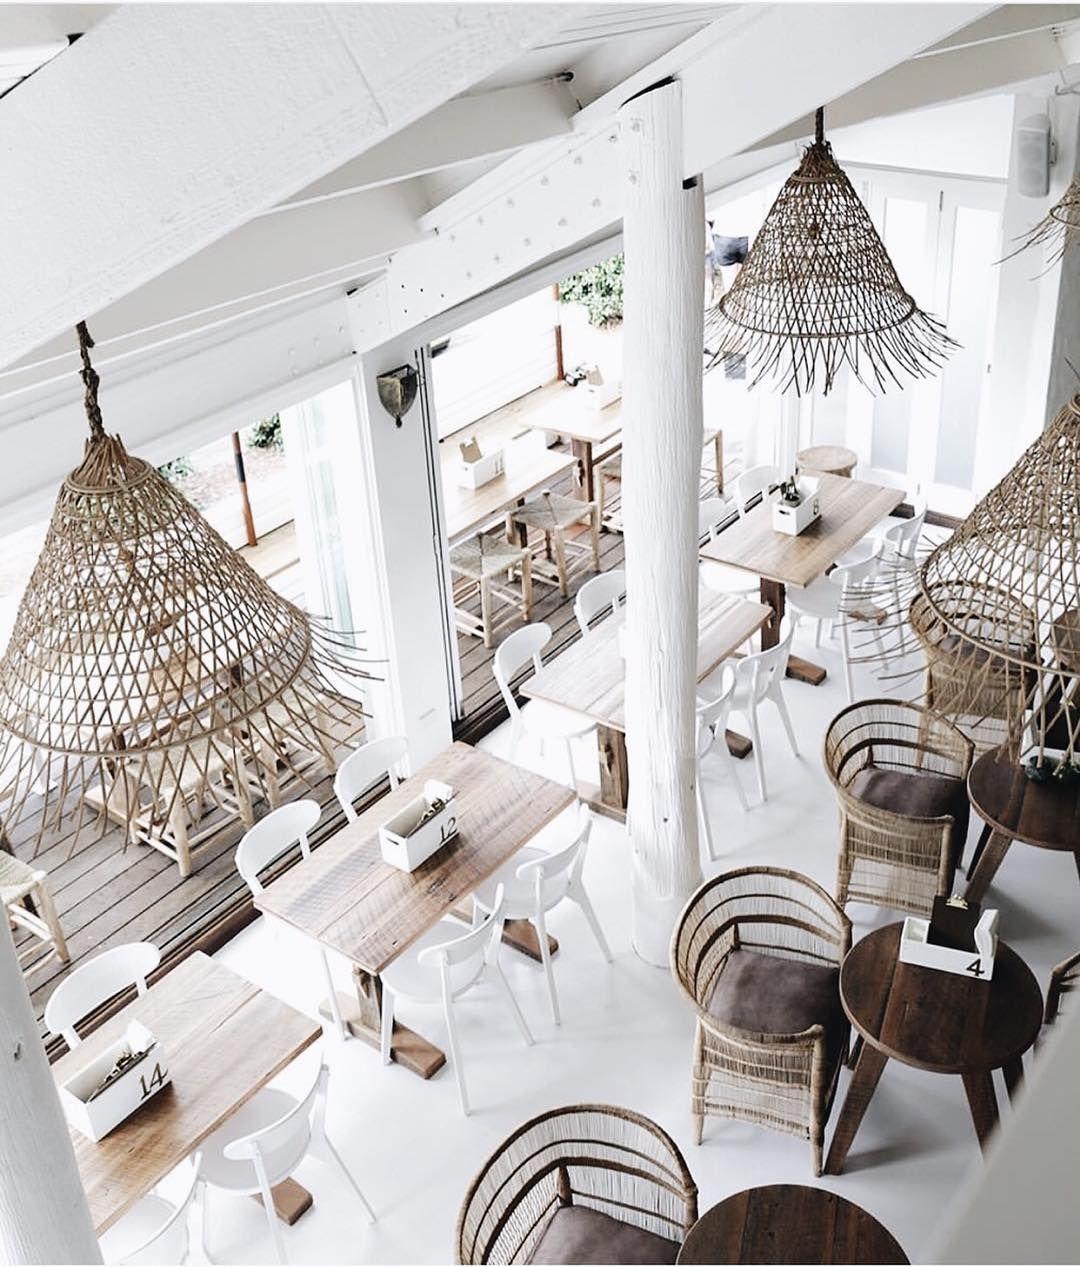 Amazing Interior Design Groups Part - 11: Mez Club Byron Bay - $43-$49 Set Menu For Groups Of 8+